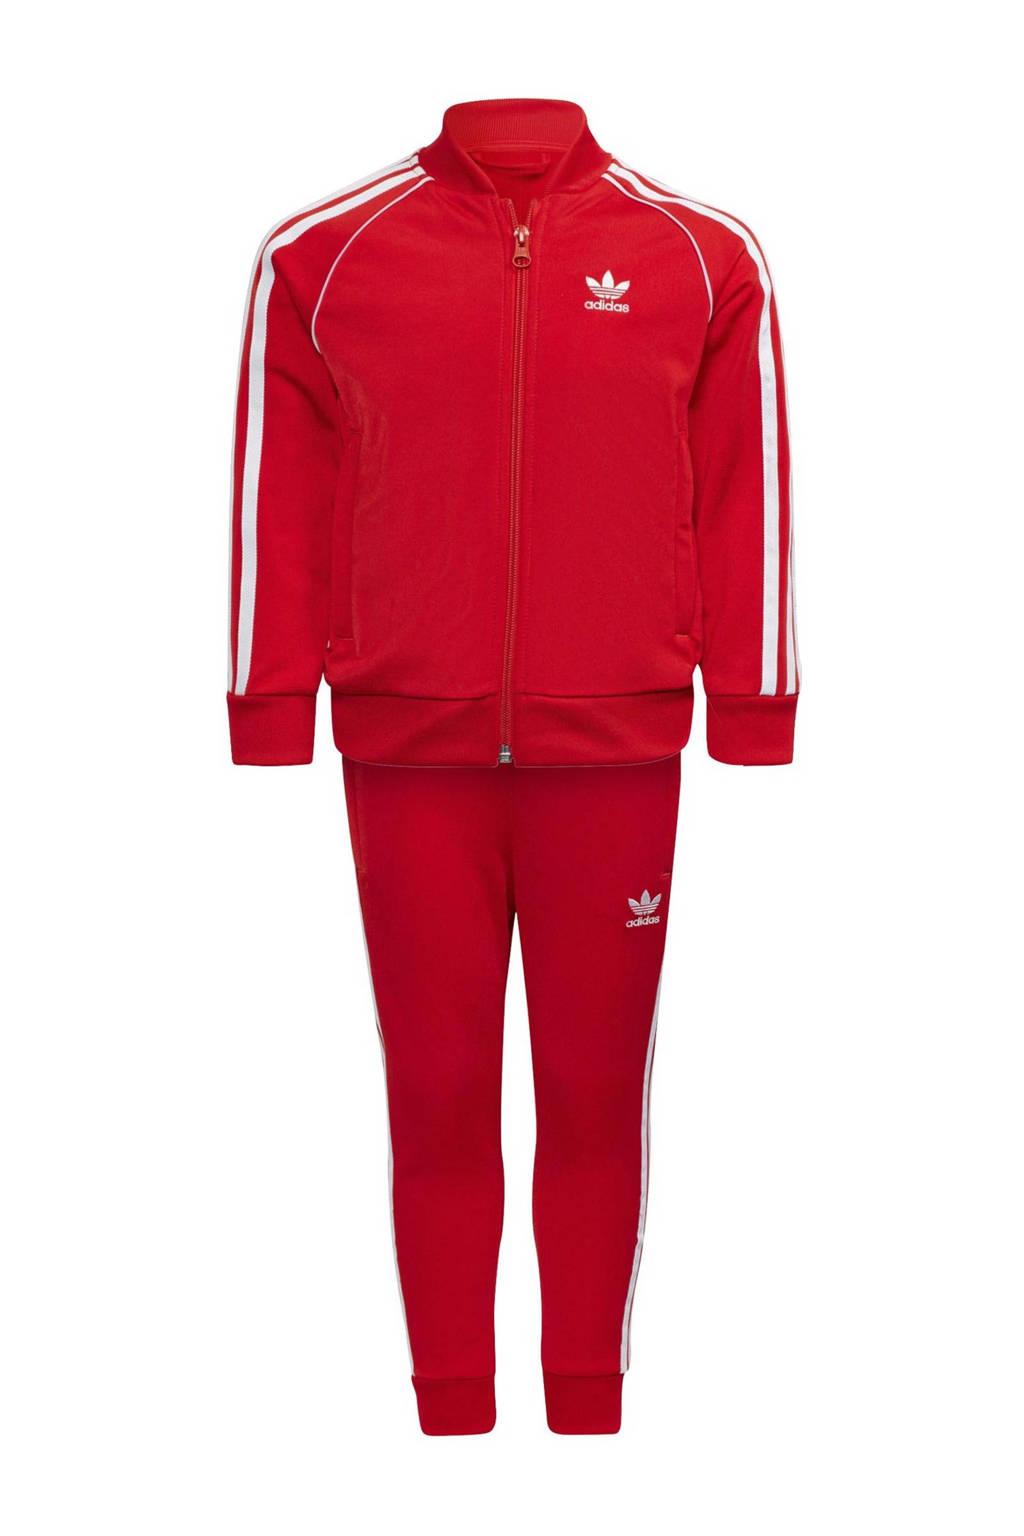 adidas Originals   Super Star Adicolor trainingspak rood/wit, Rood/wit